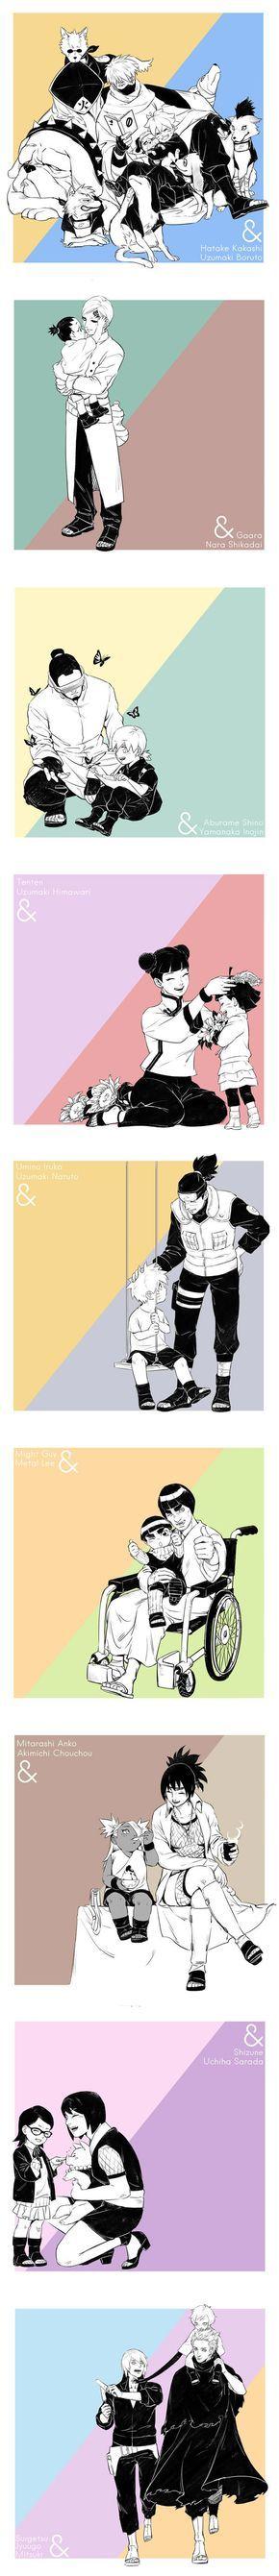 Naruto: Remembering Your Sensei (By Black Marlboro) - 9GAG